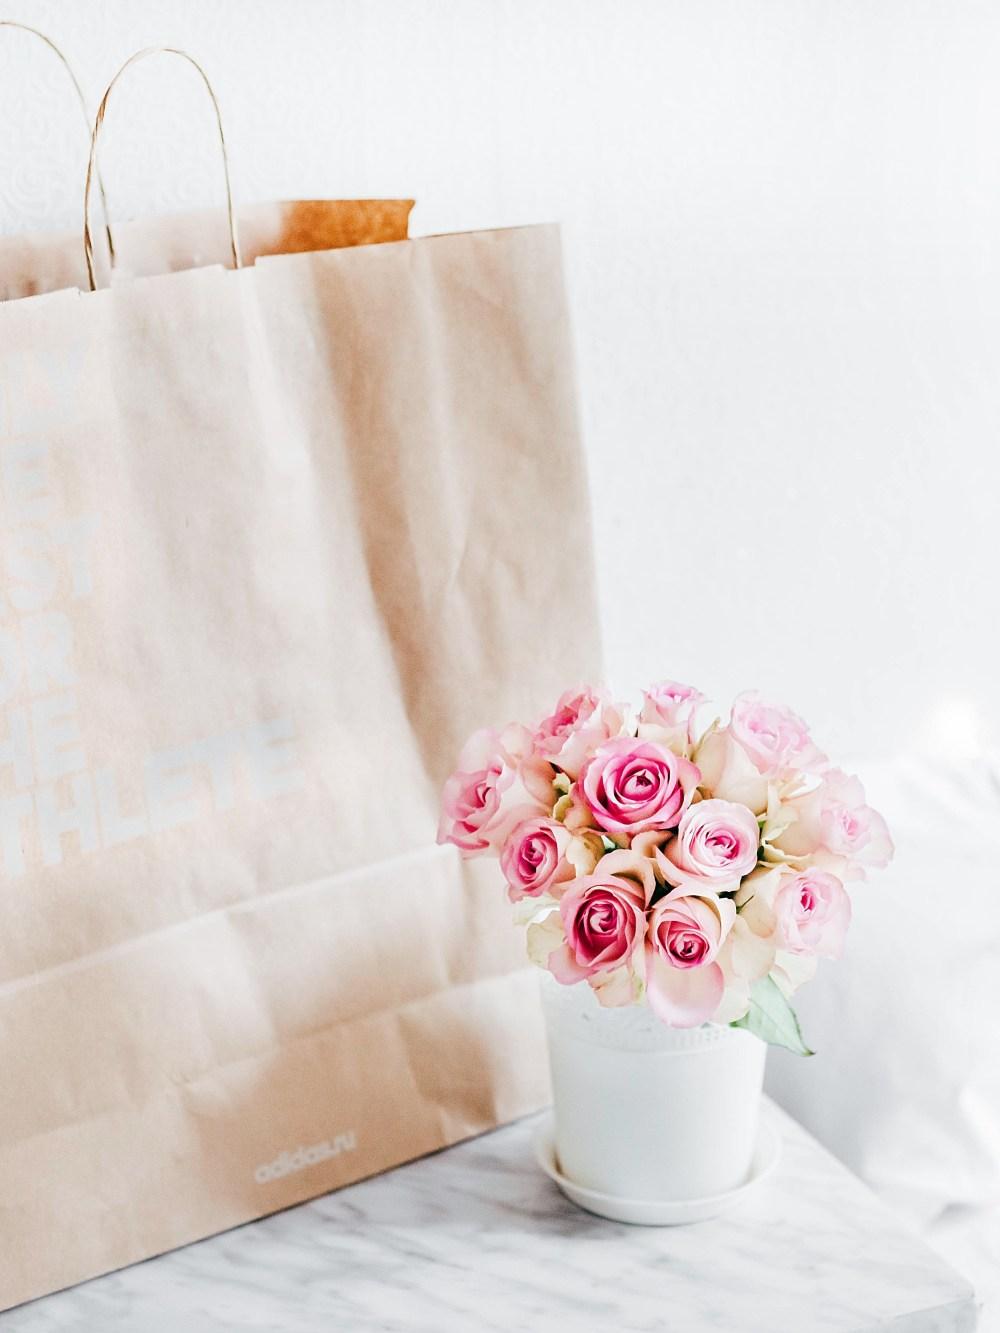 personal shopper alexandra-gorn-350218-unsplash